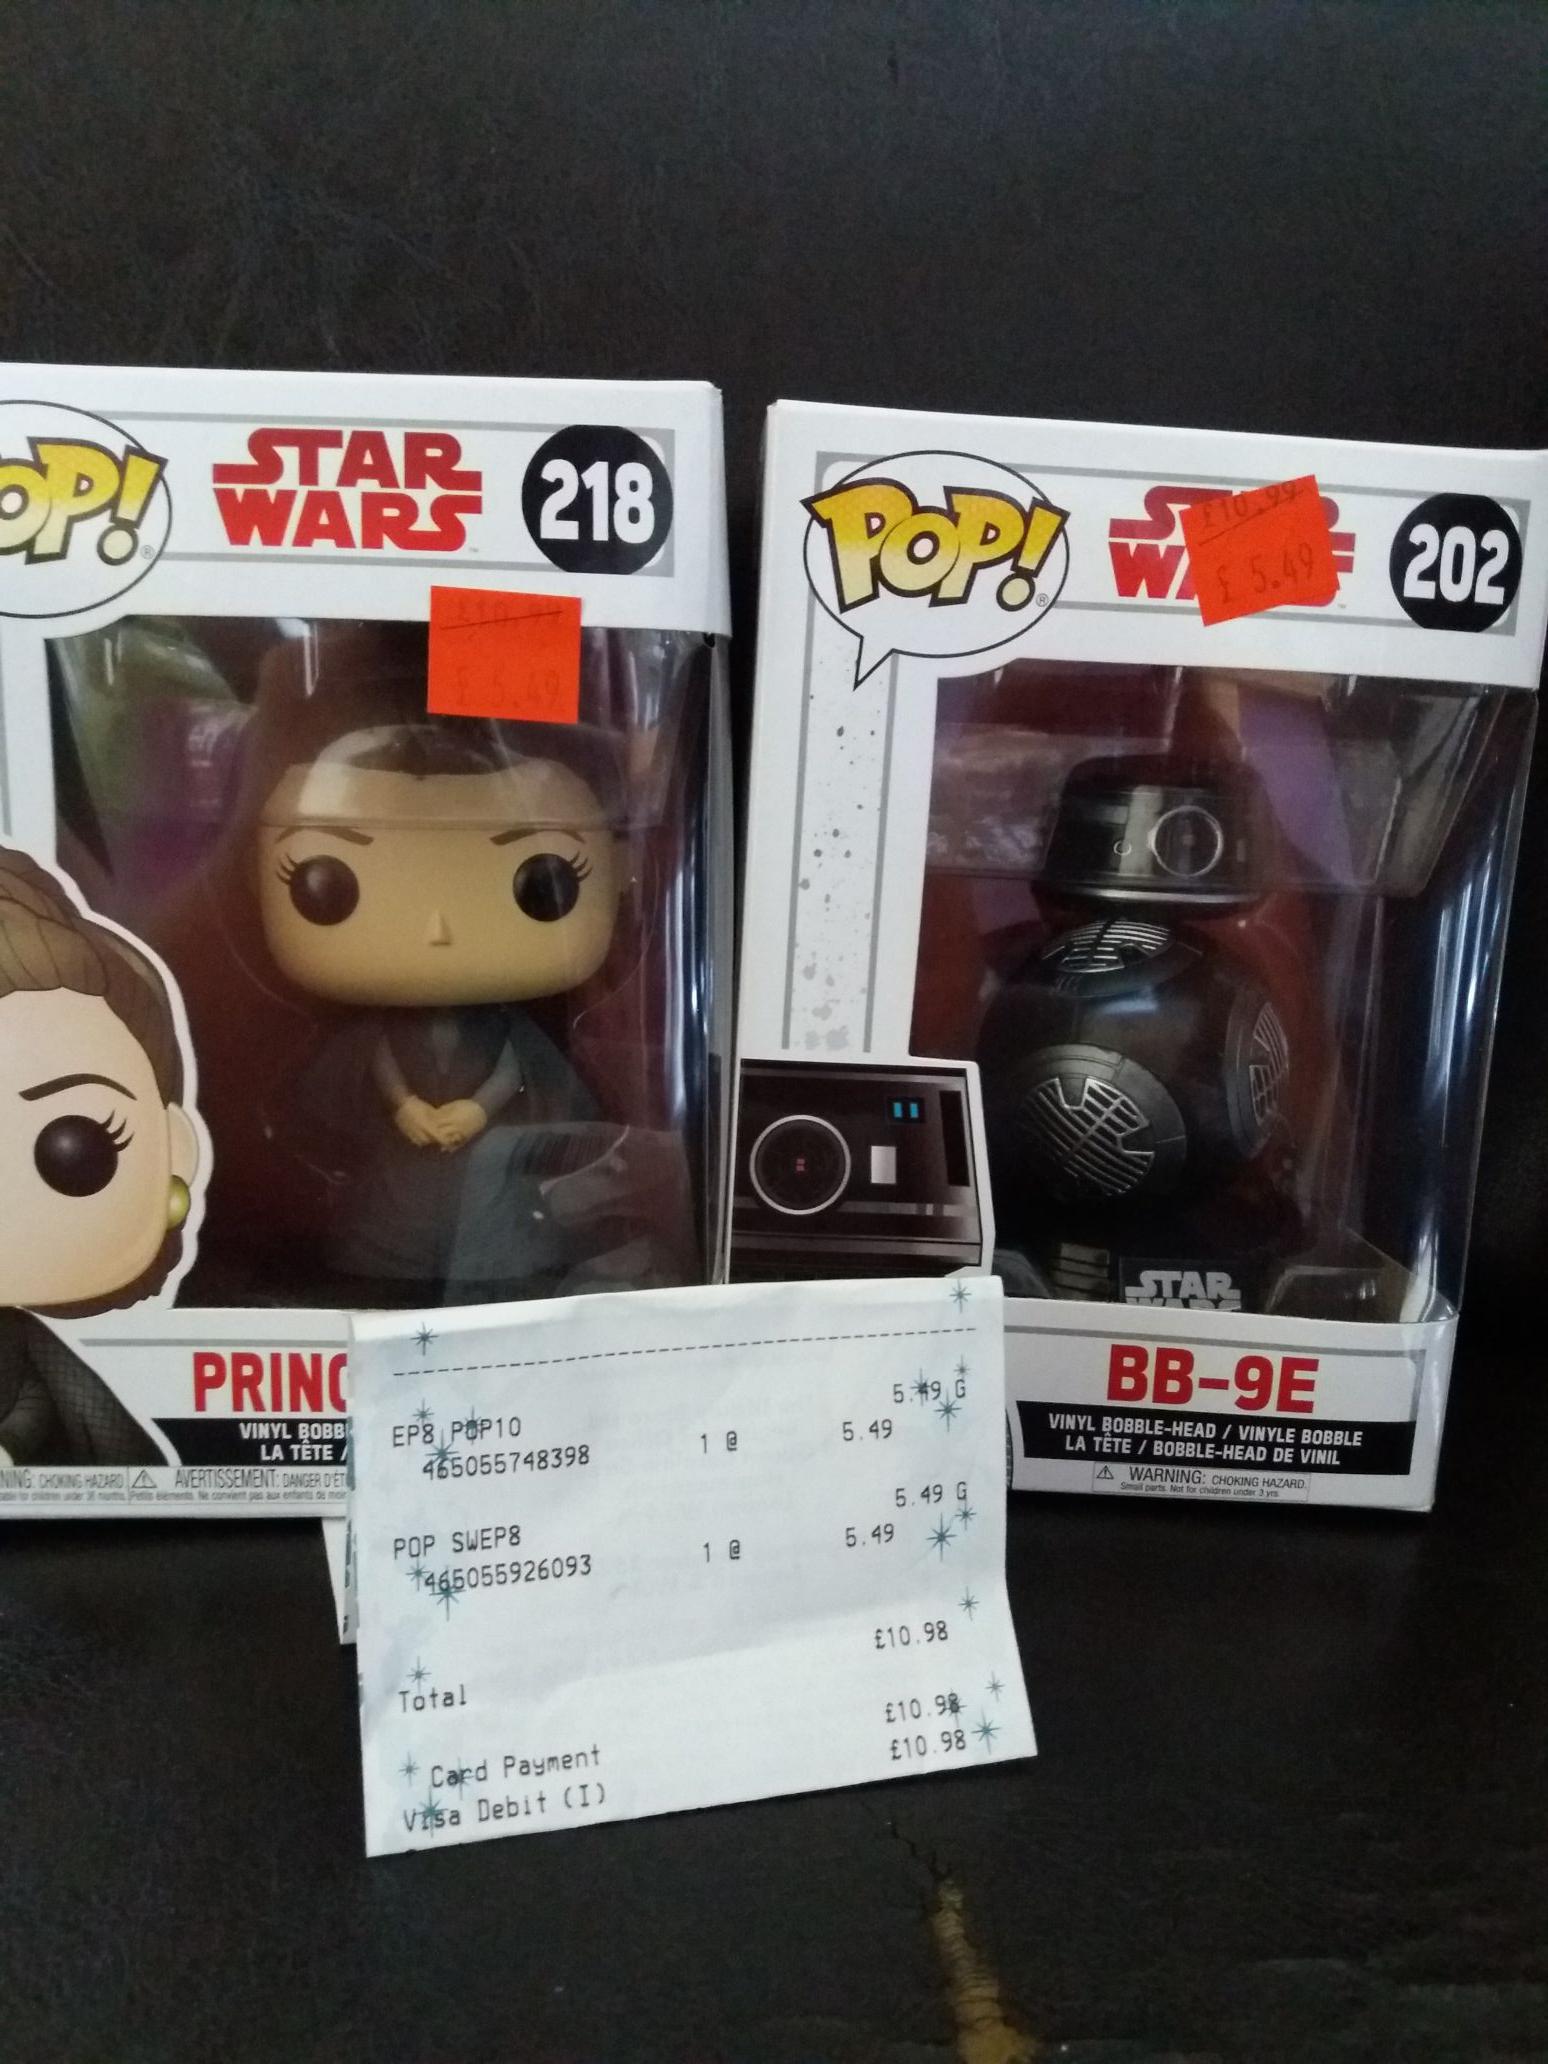 Star wars pop vinyl figures reduced to £5.49 instore & online @ Disney store.